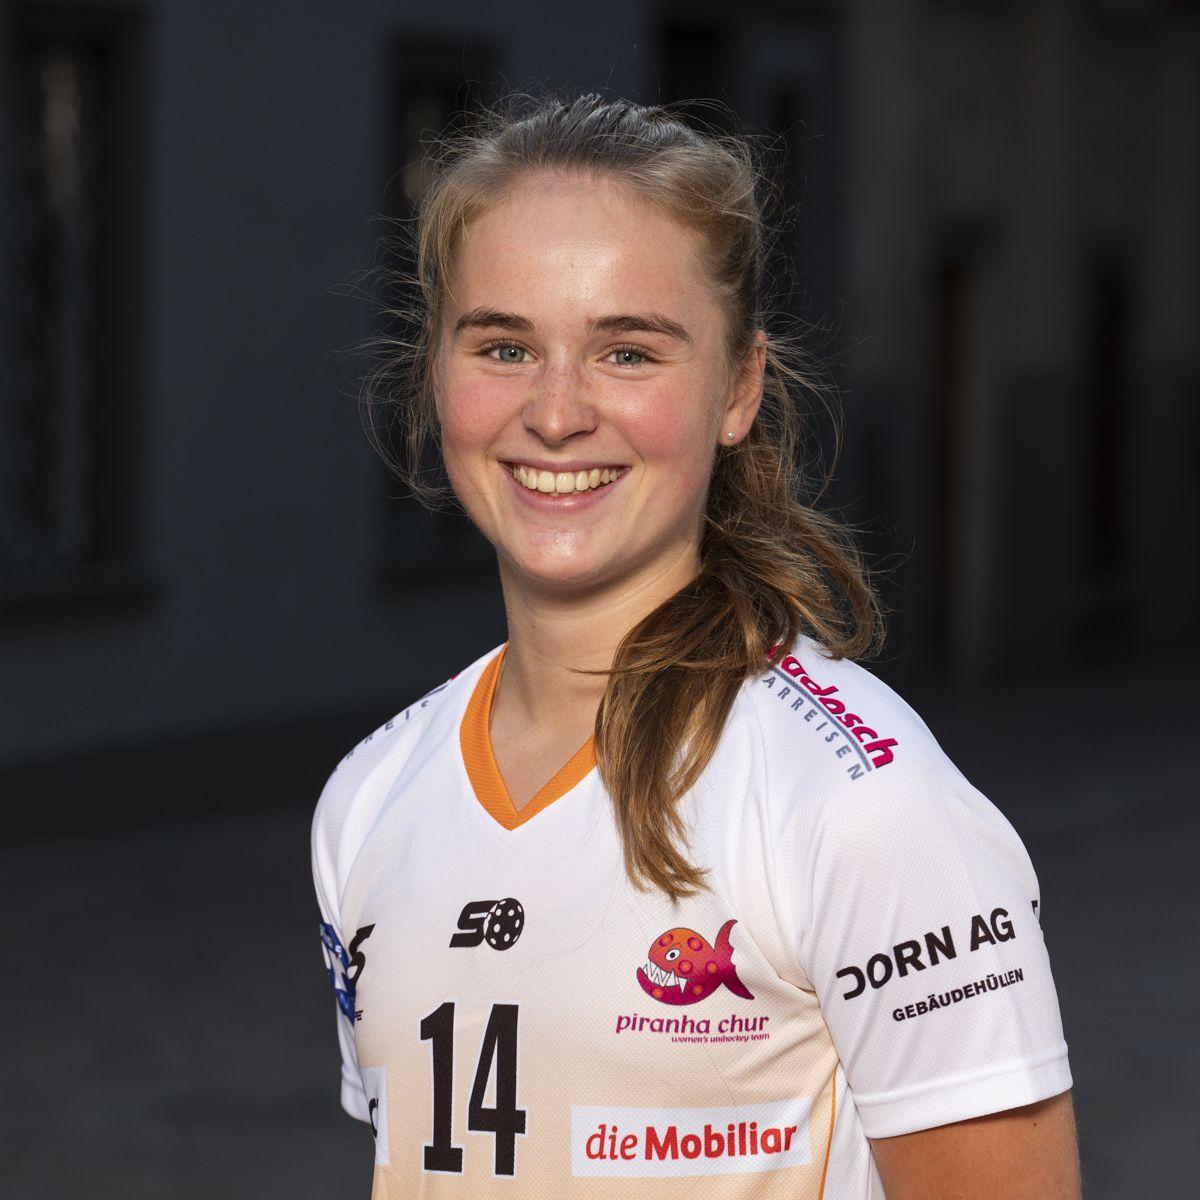 Pascale Huber #14_NLA_piranha Chur_Saison 2019-2020_1200x1200_01.jpg